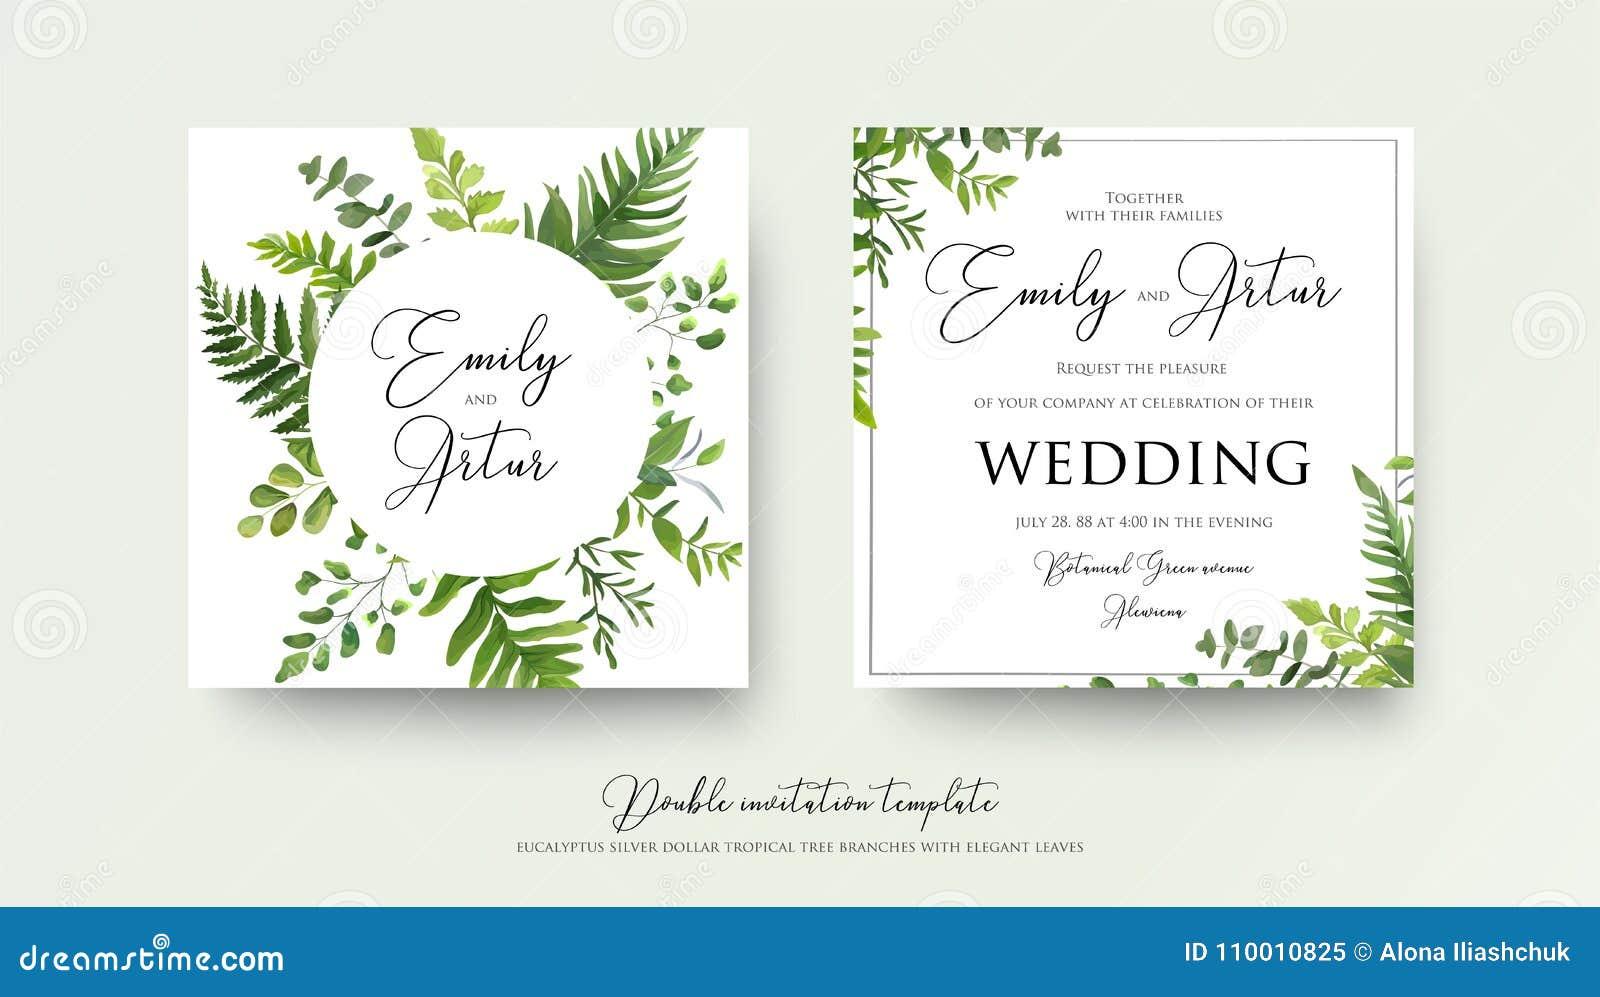 Wedding floral watercolor style double invite, invitation, save